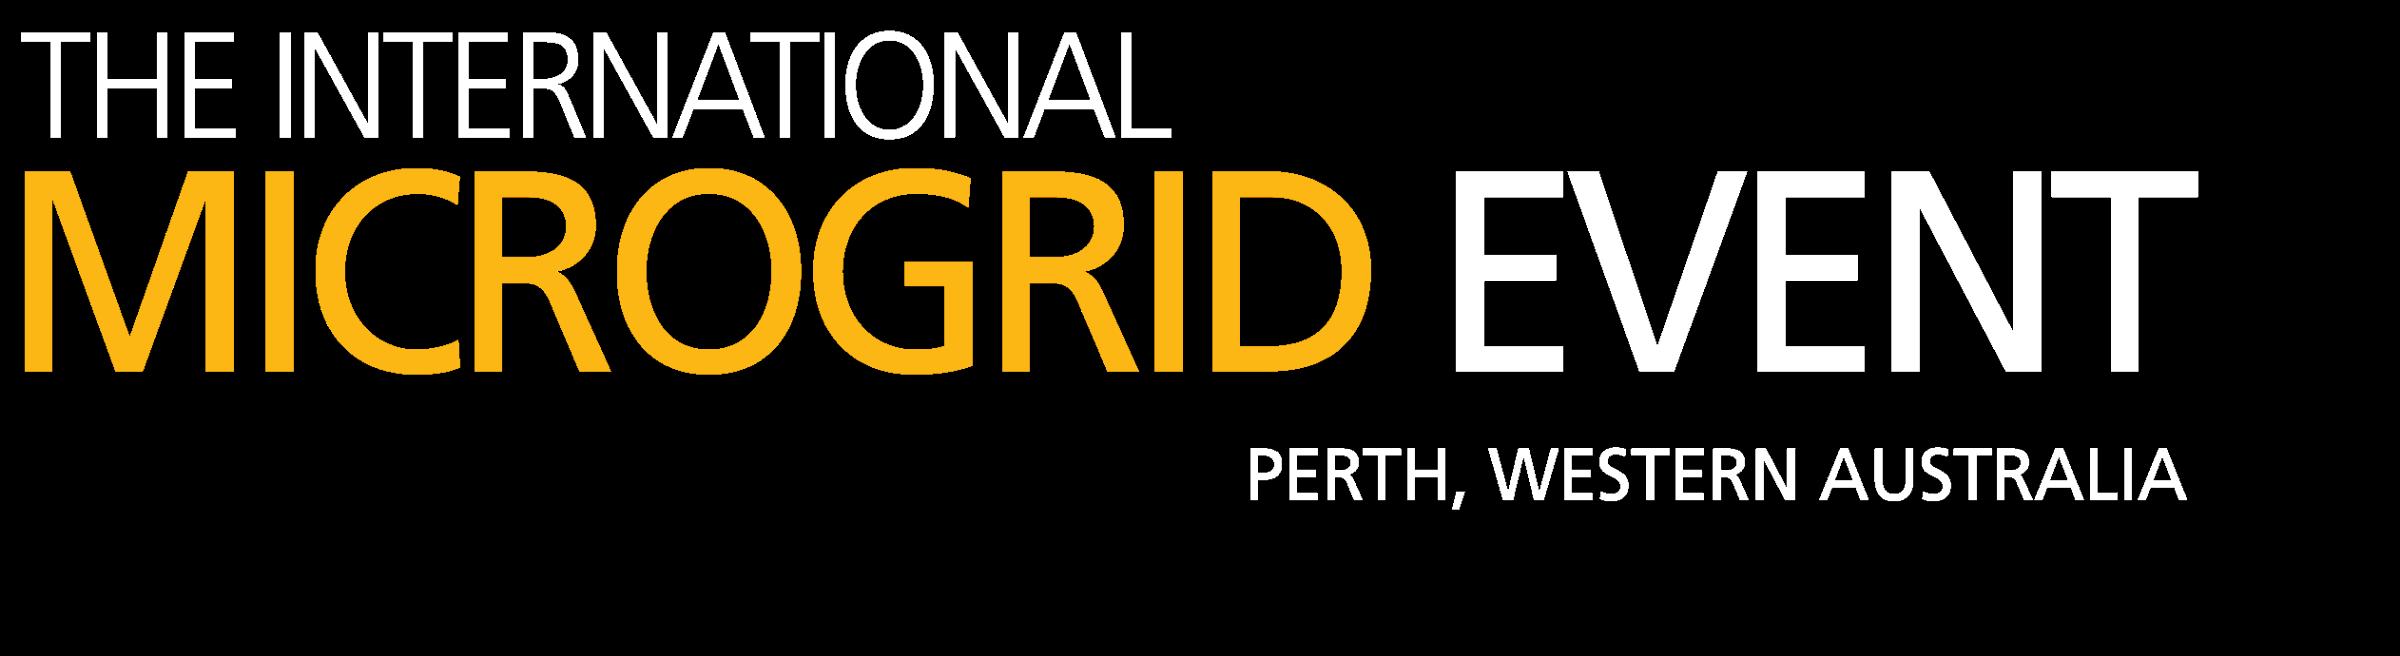 The International Microgrid Event